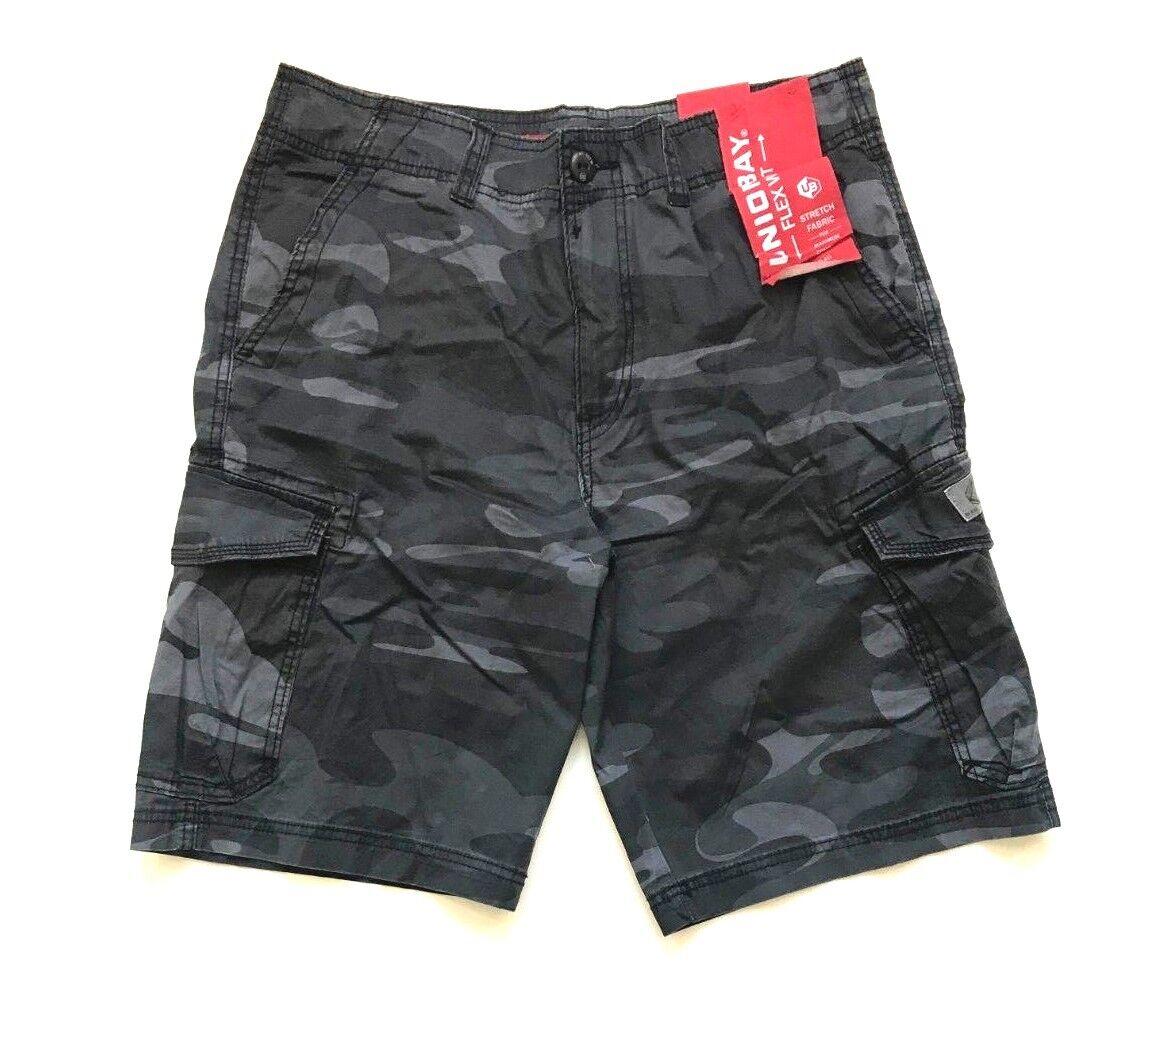 NWT Unionbay Men's Lightweight Cargo Shorts Black Camo, Si